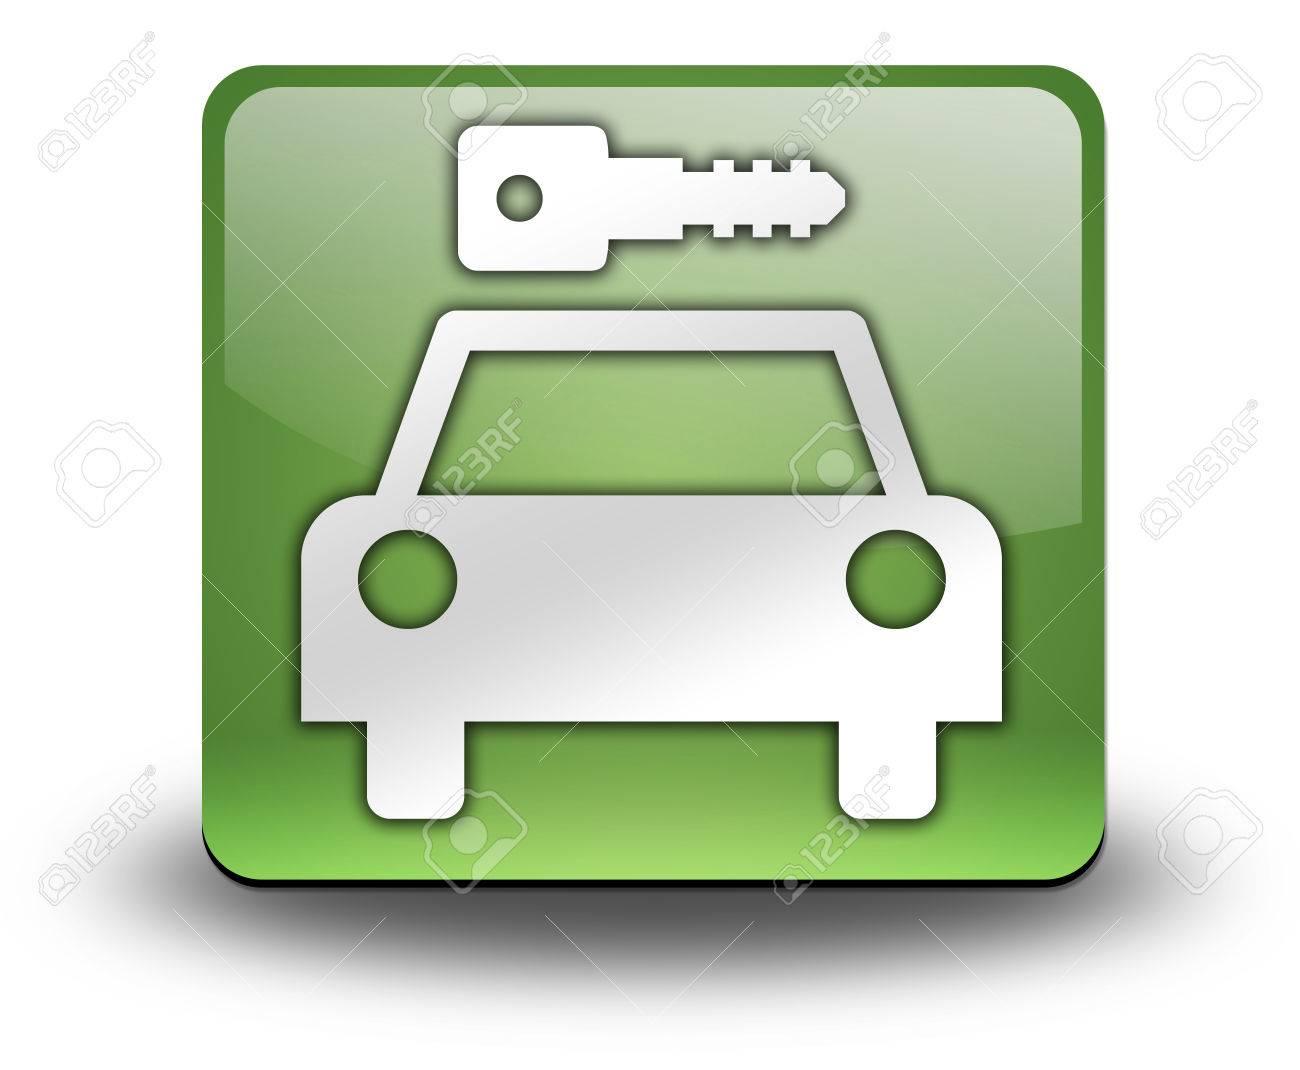 Icon, Button, Pictogram with Car Rental symbol Stock Photo - 27201102